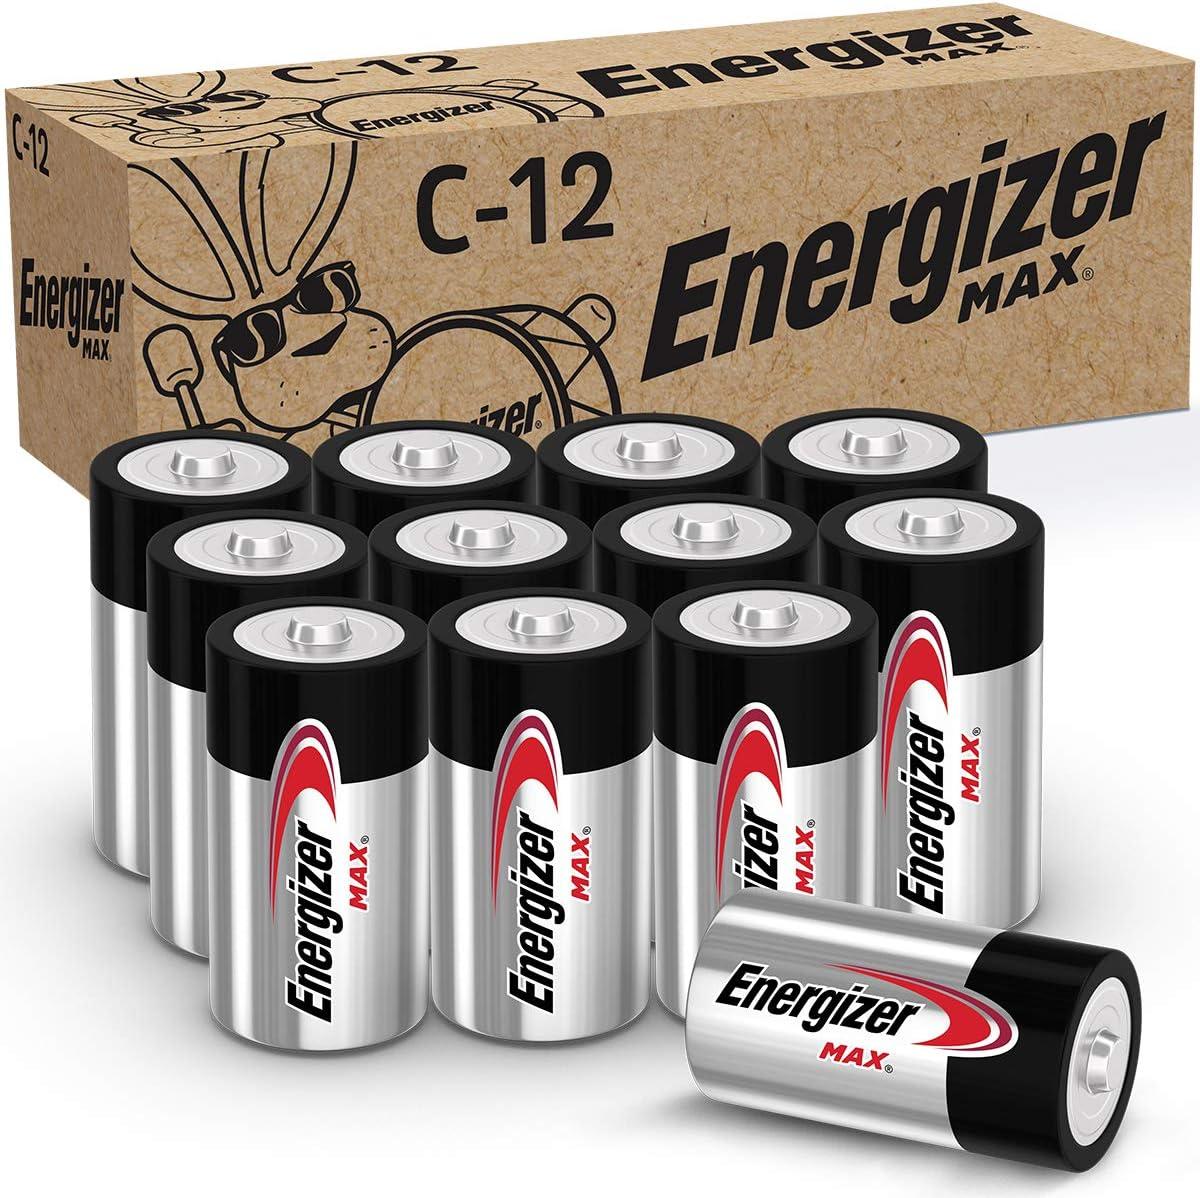 Energizer MAX C Batteries, Premium Alkaline C Cell Batteries (12 Battery Count): Health & Personal Care